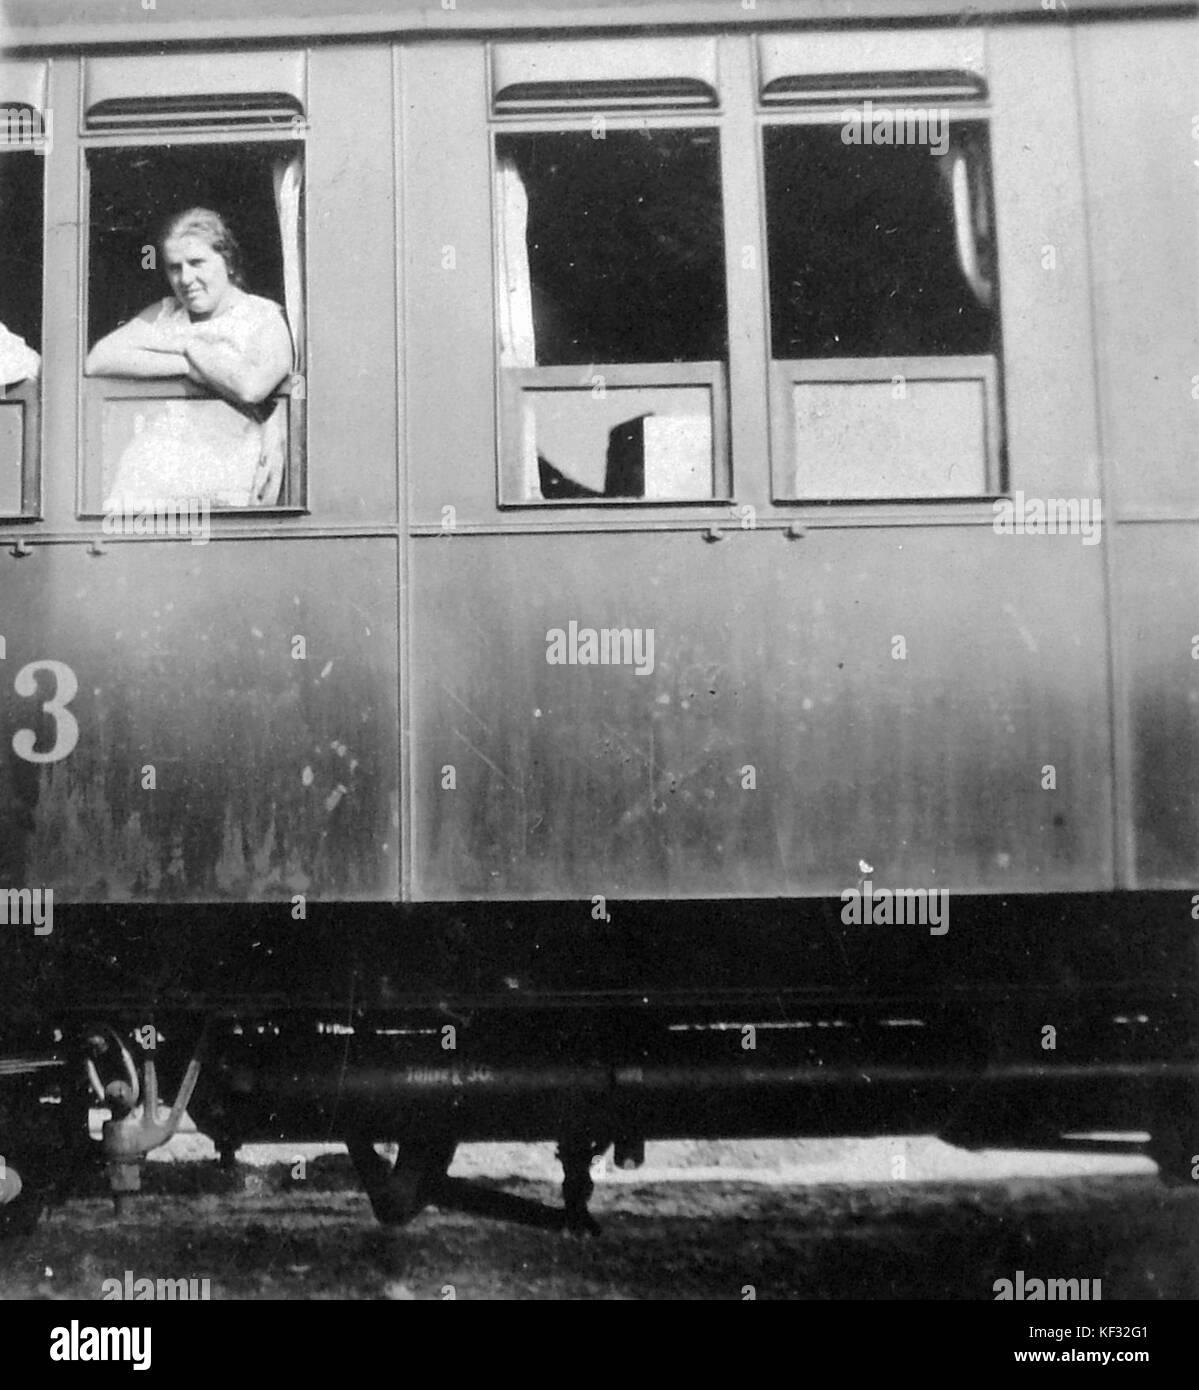 Railway 2535